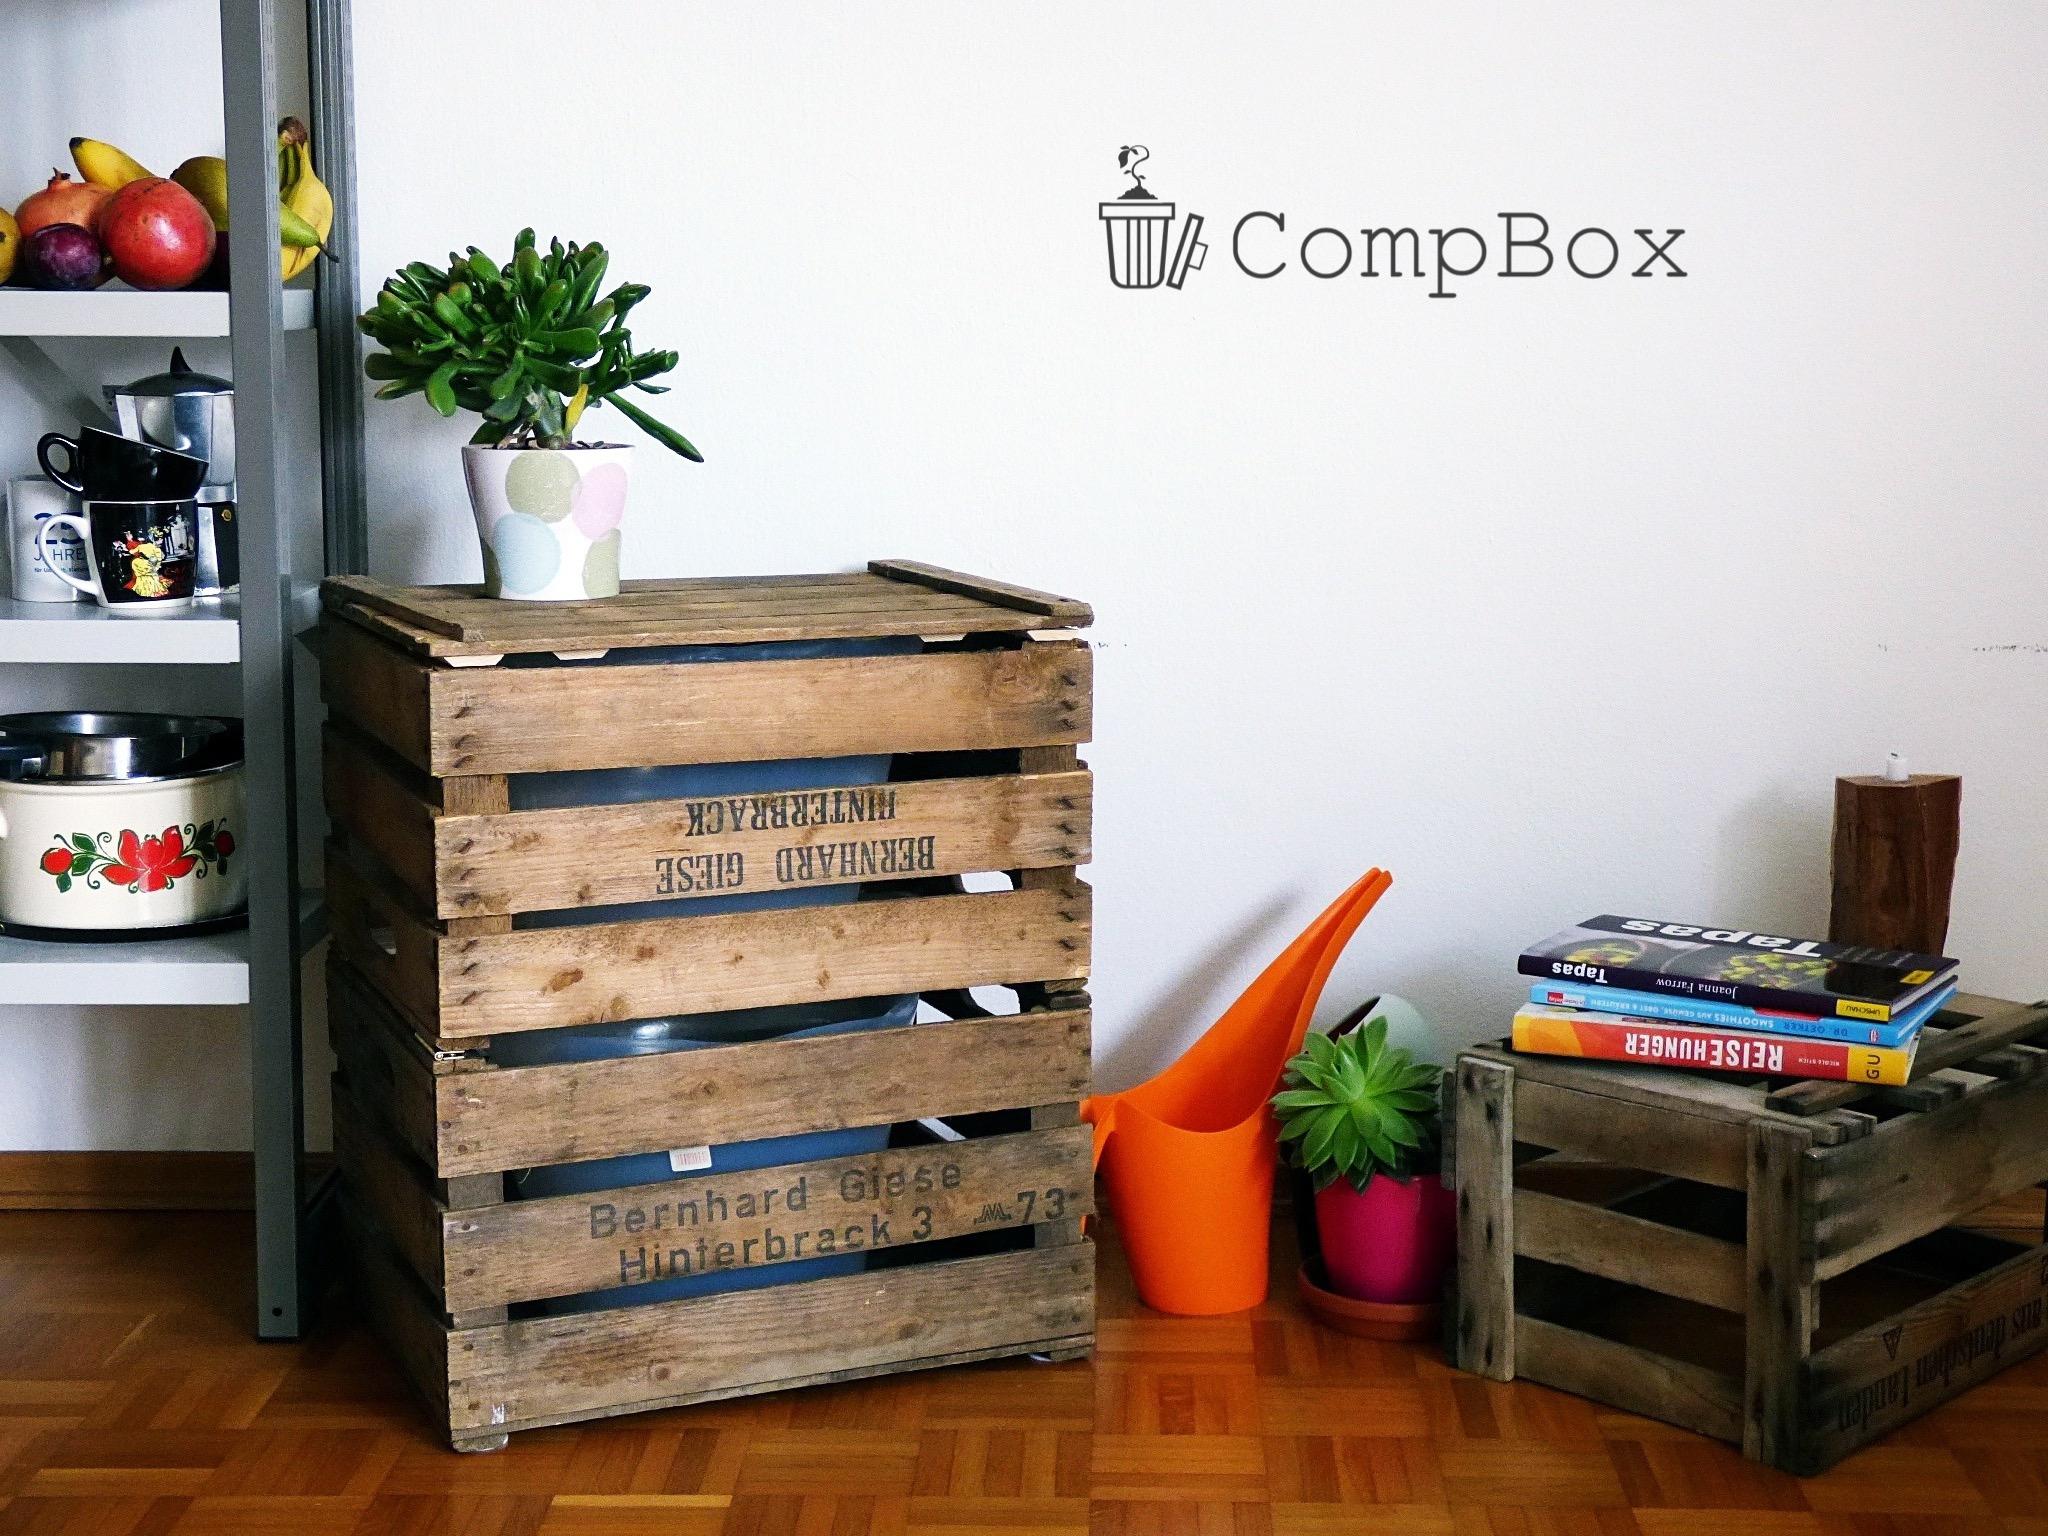 CompBox